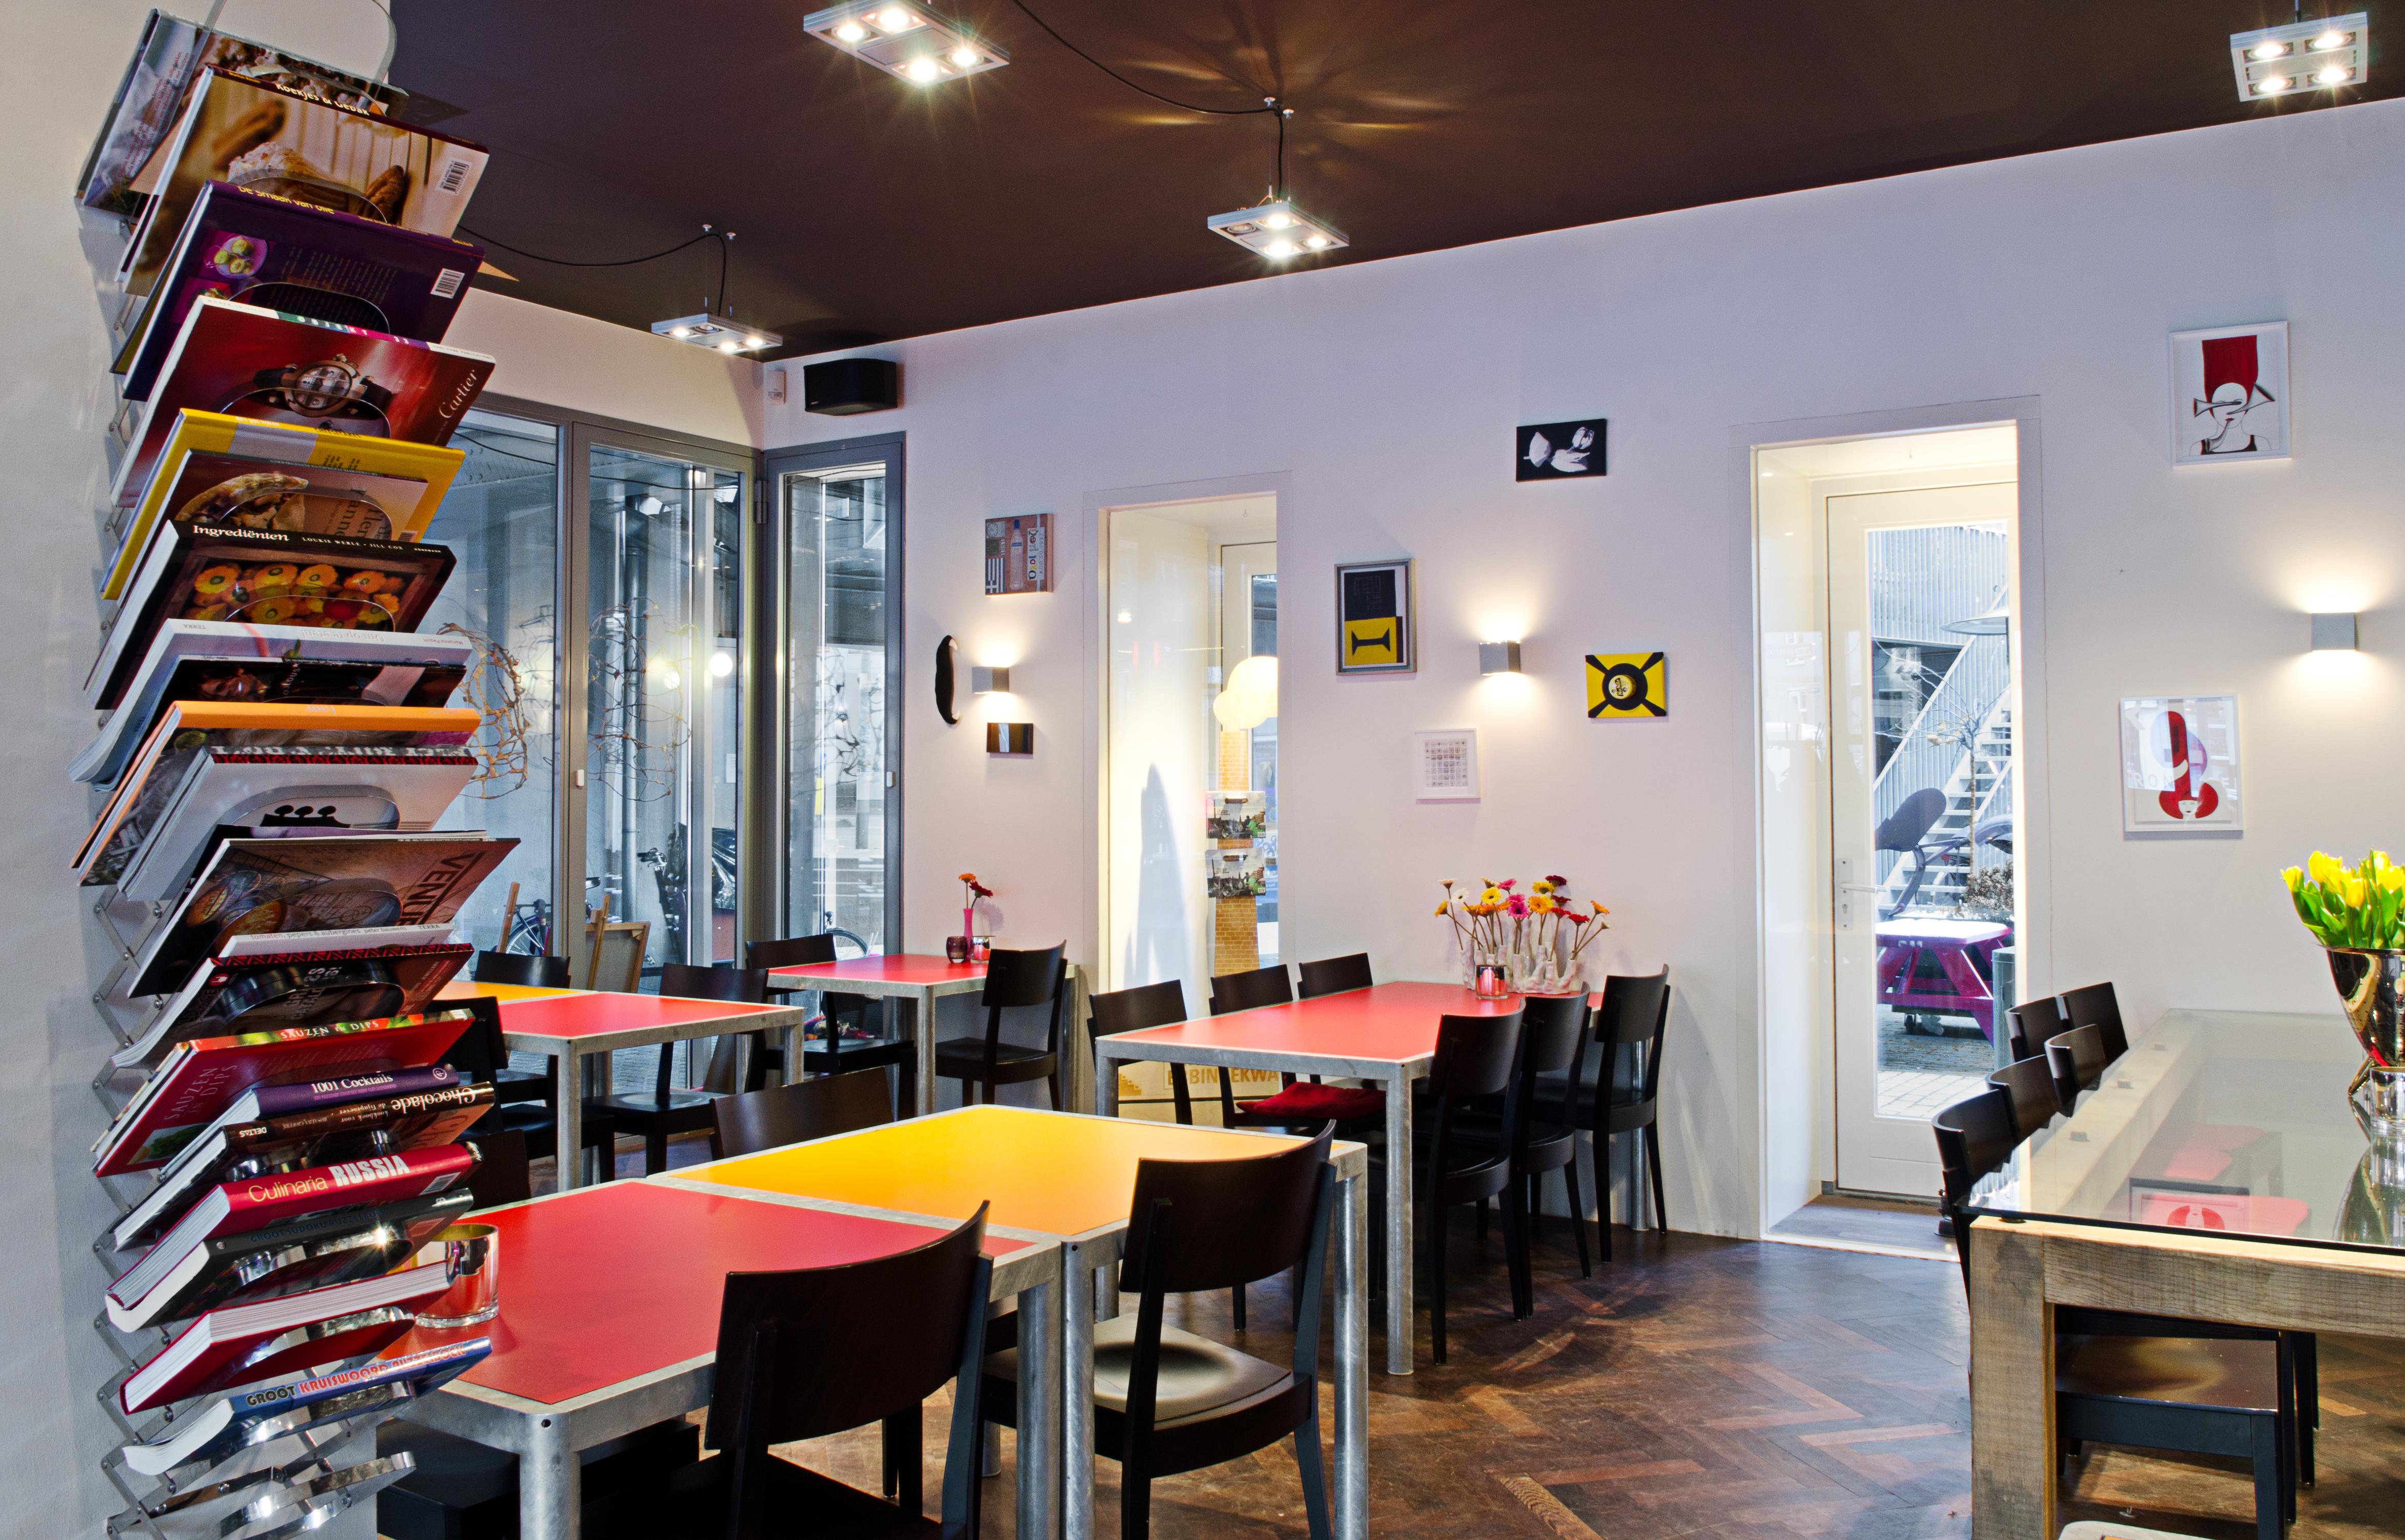 Brasserie Het Paleis